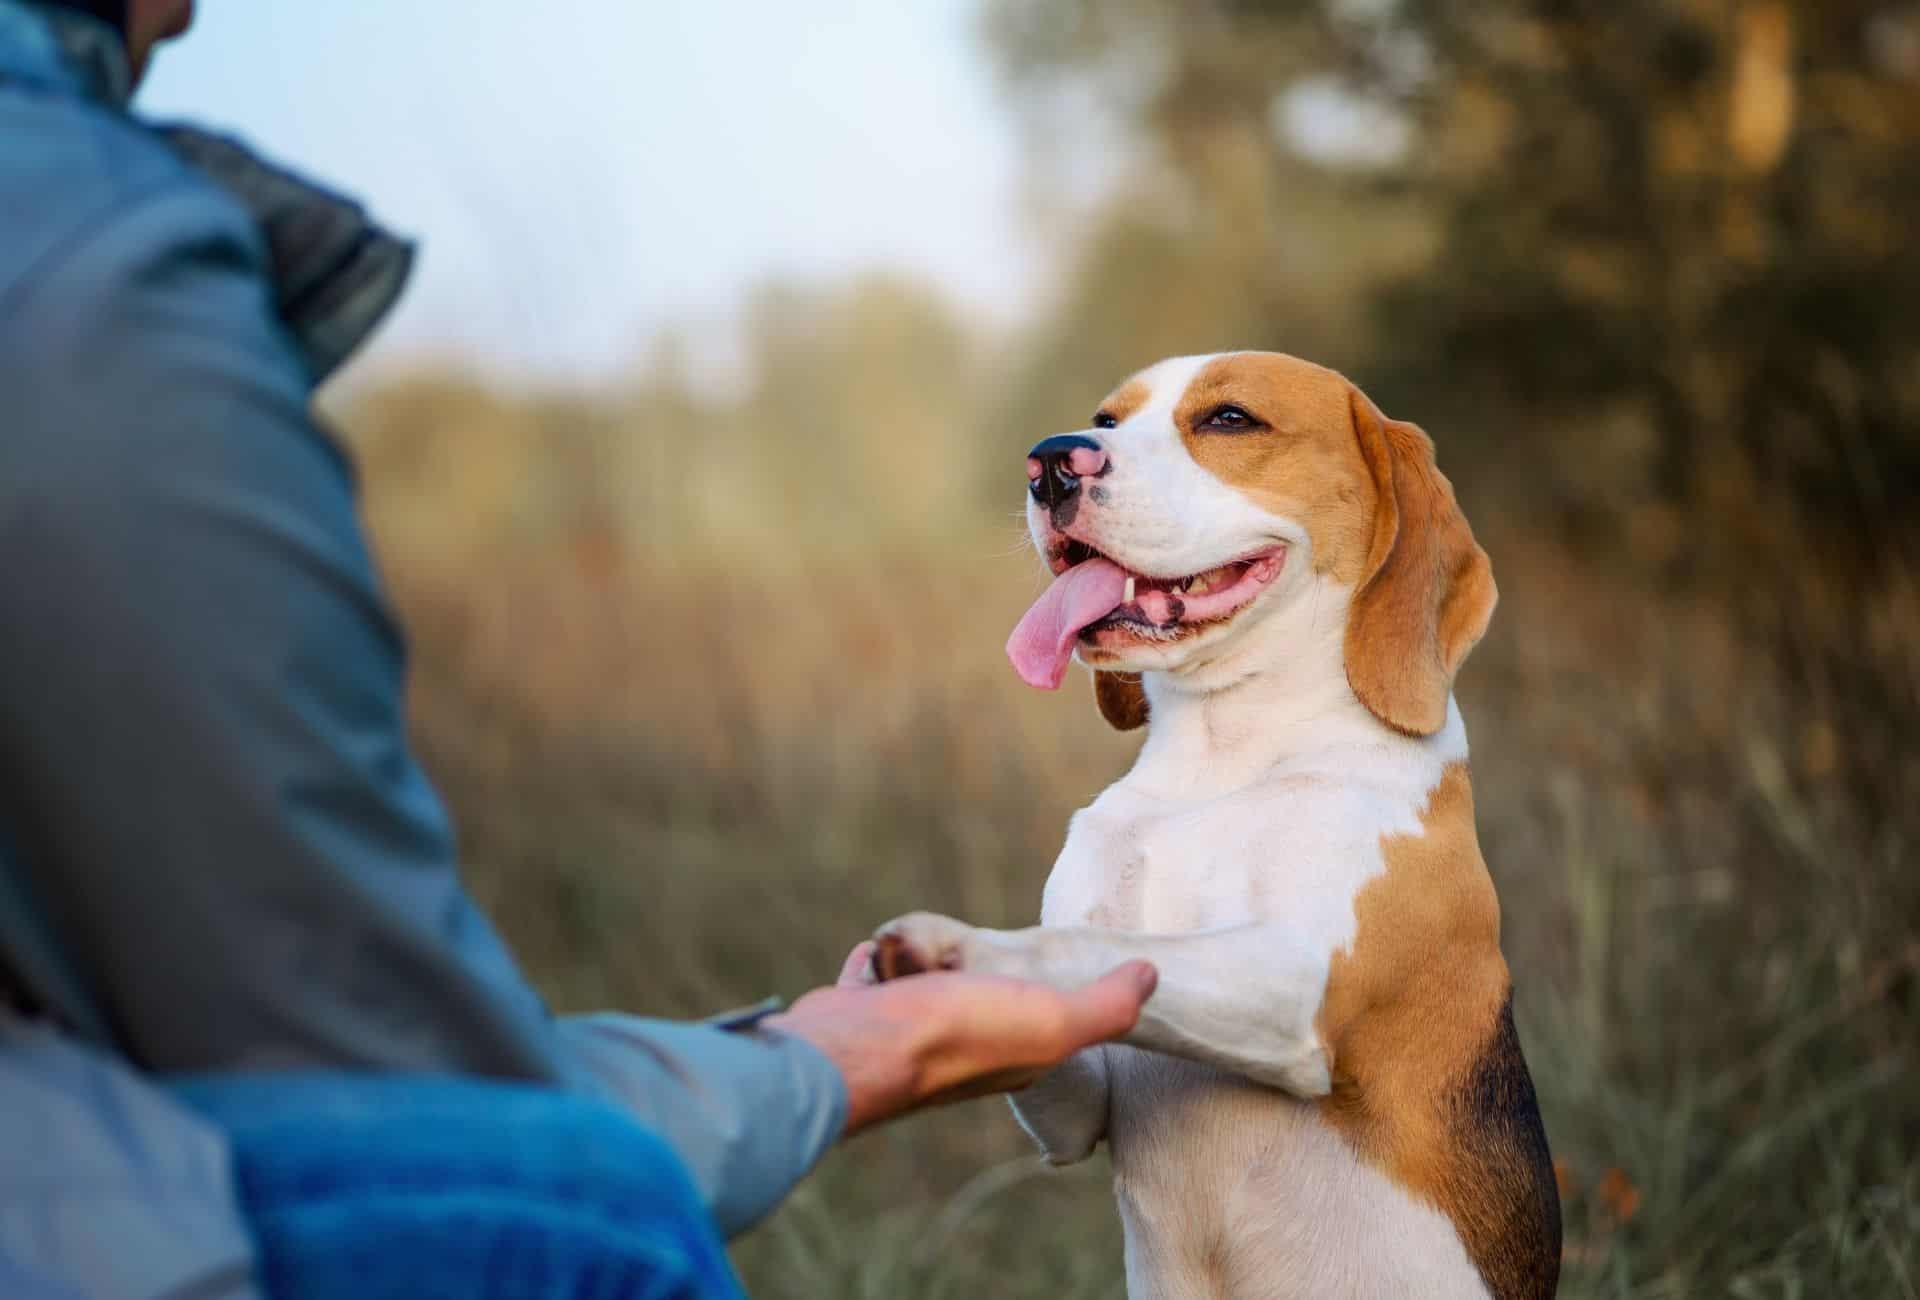 Beagle in training